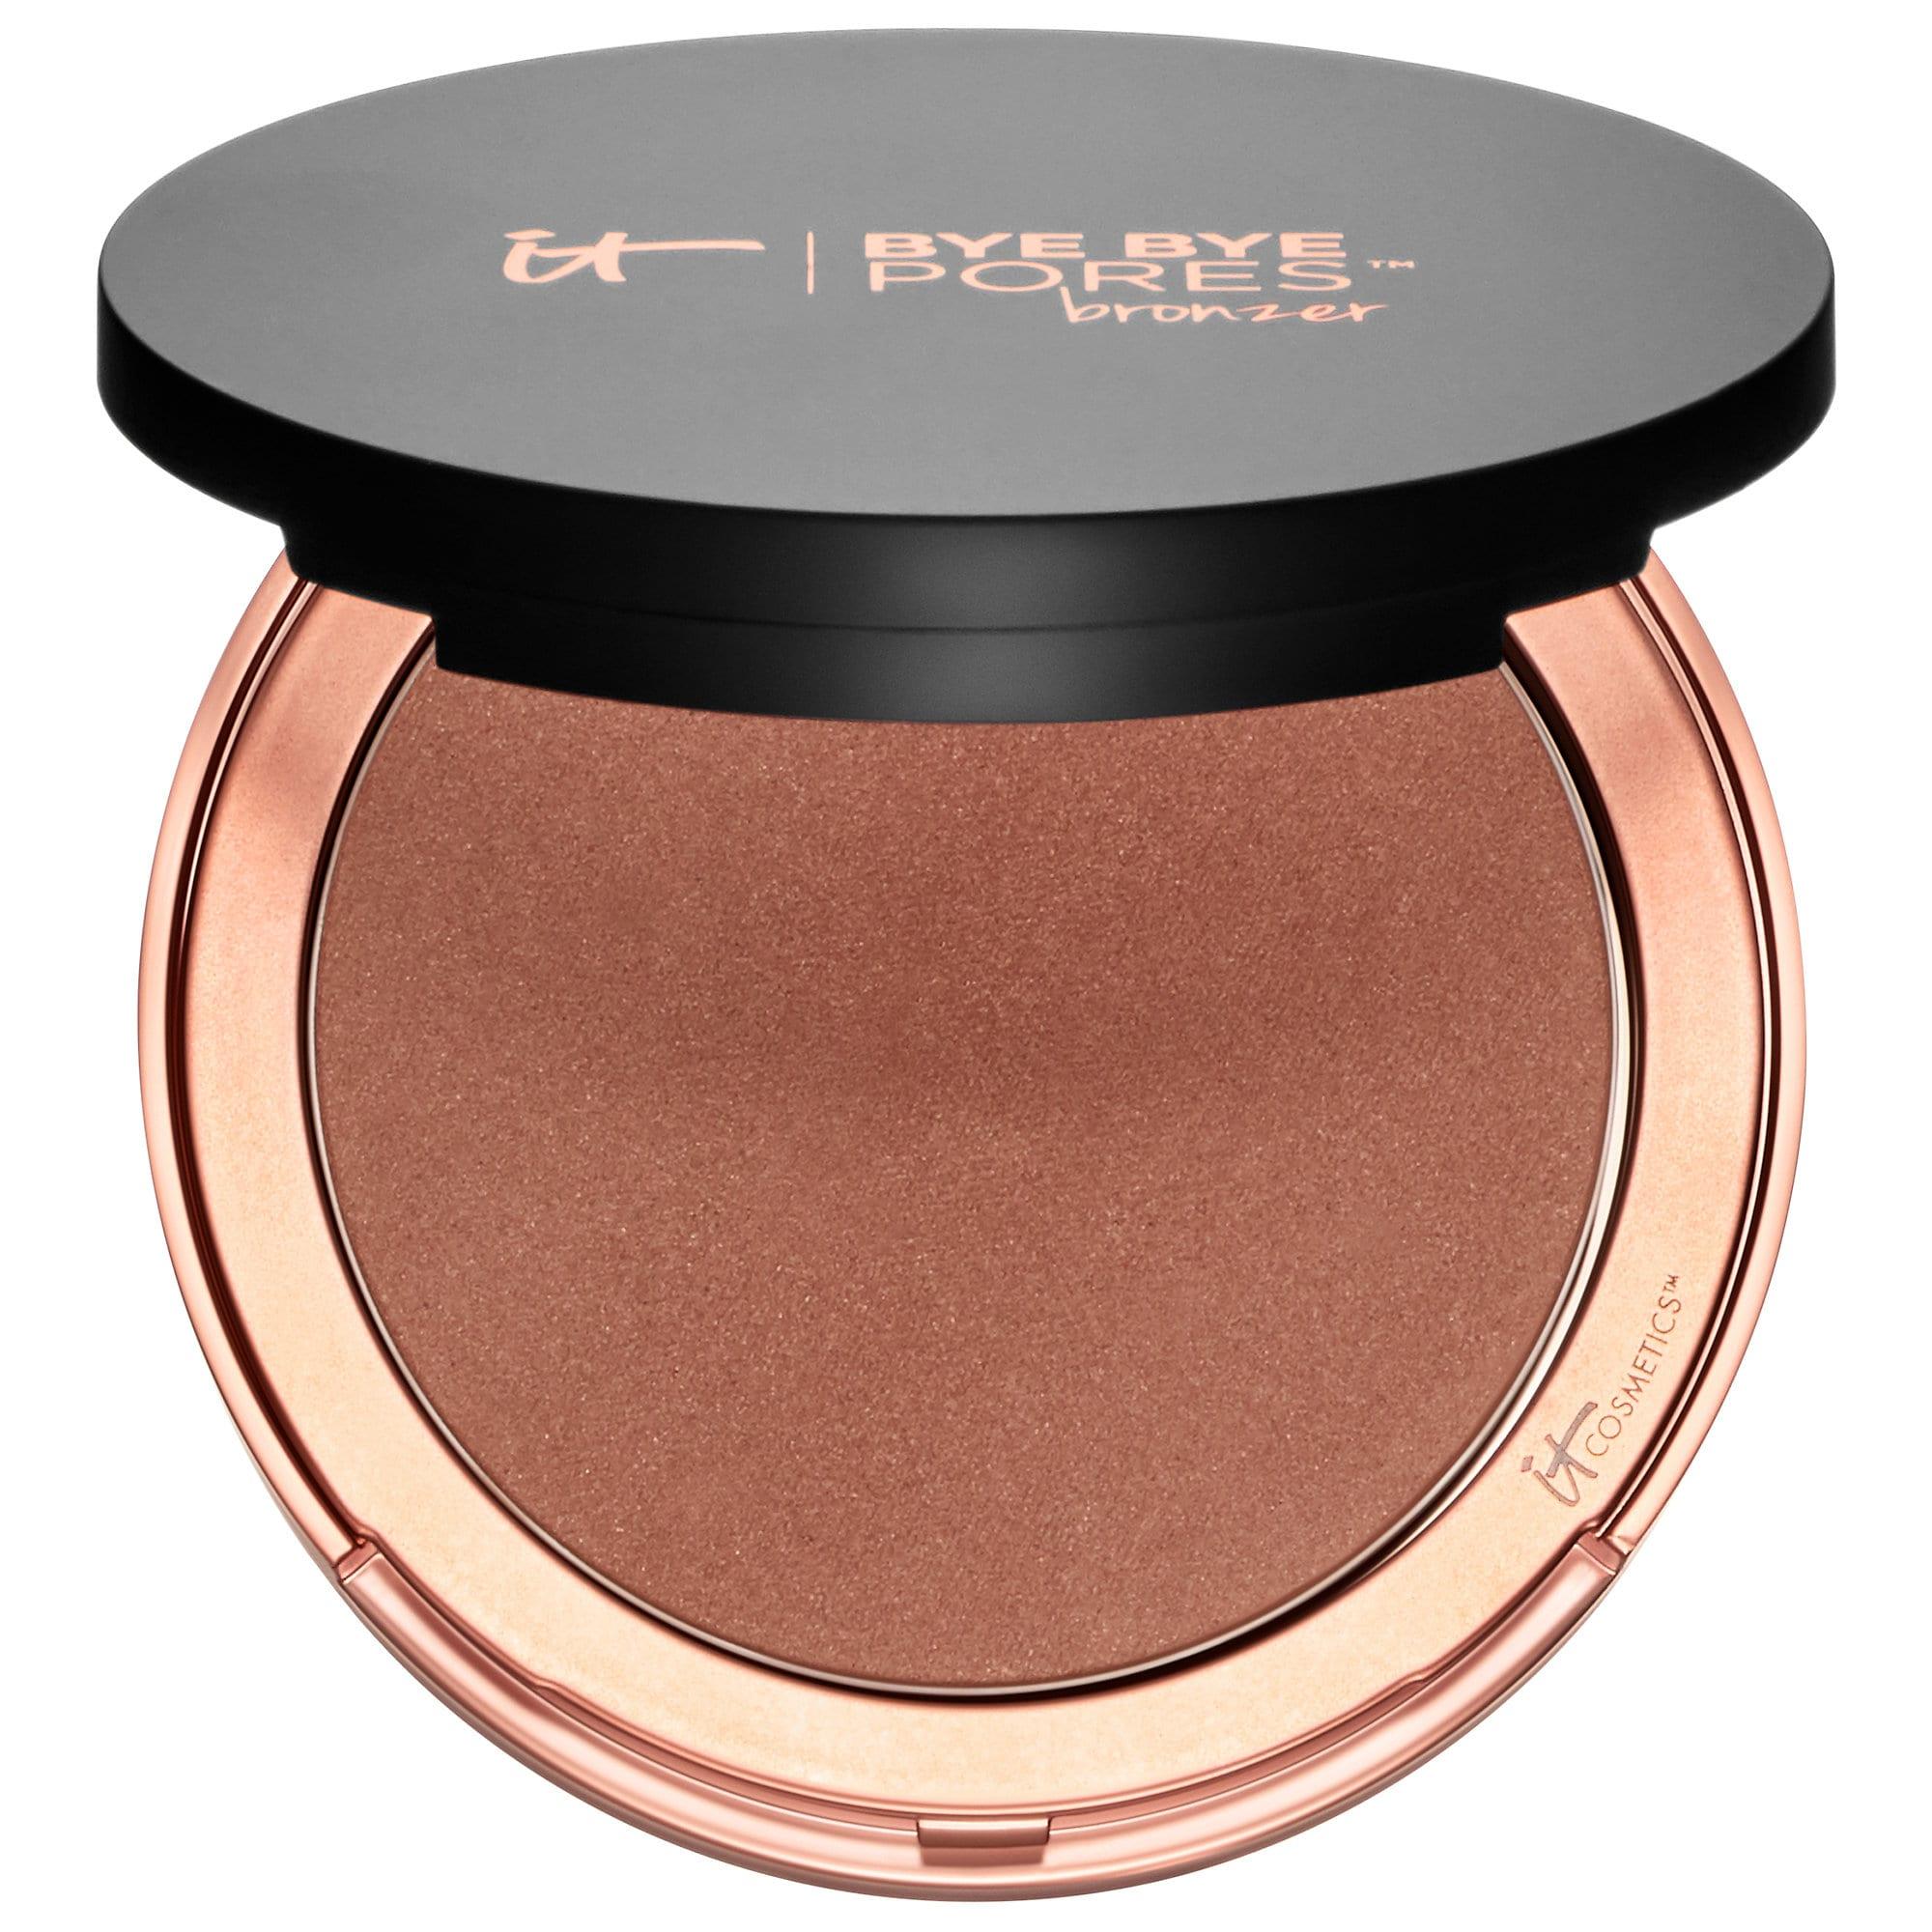 It Cosmetics Bye Bye Pores Bronzer (Suministrada)